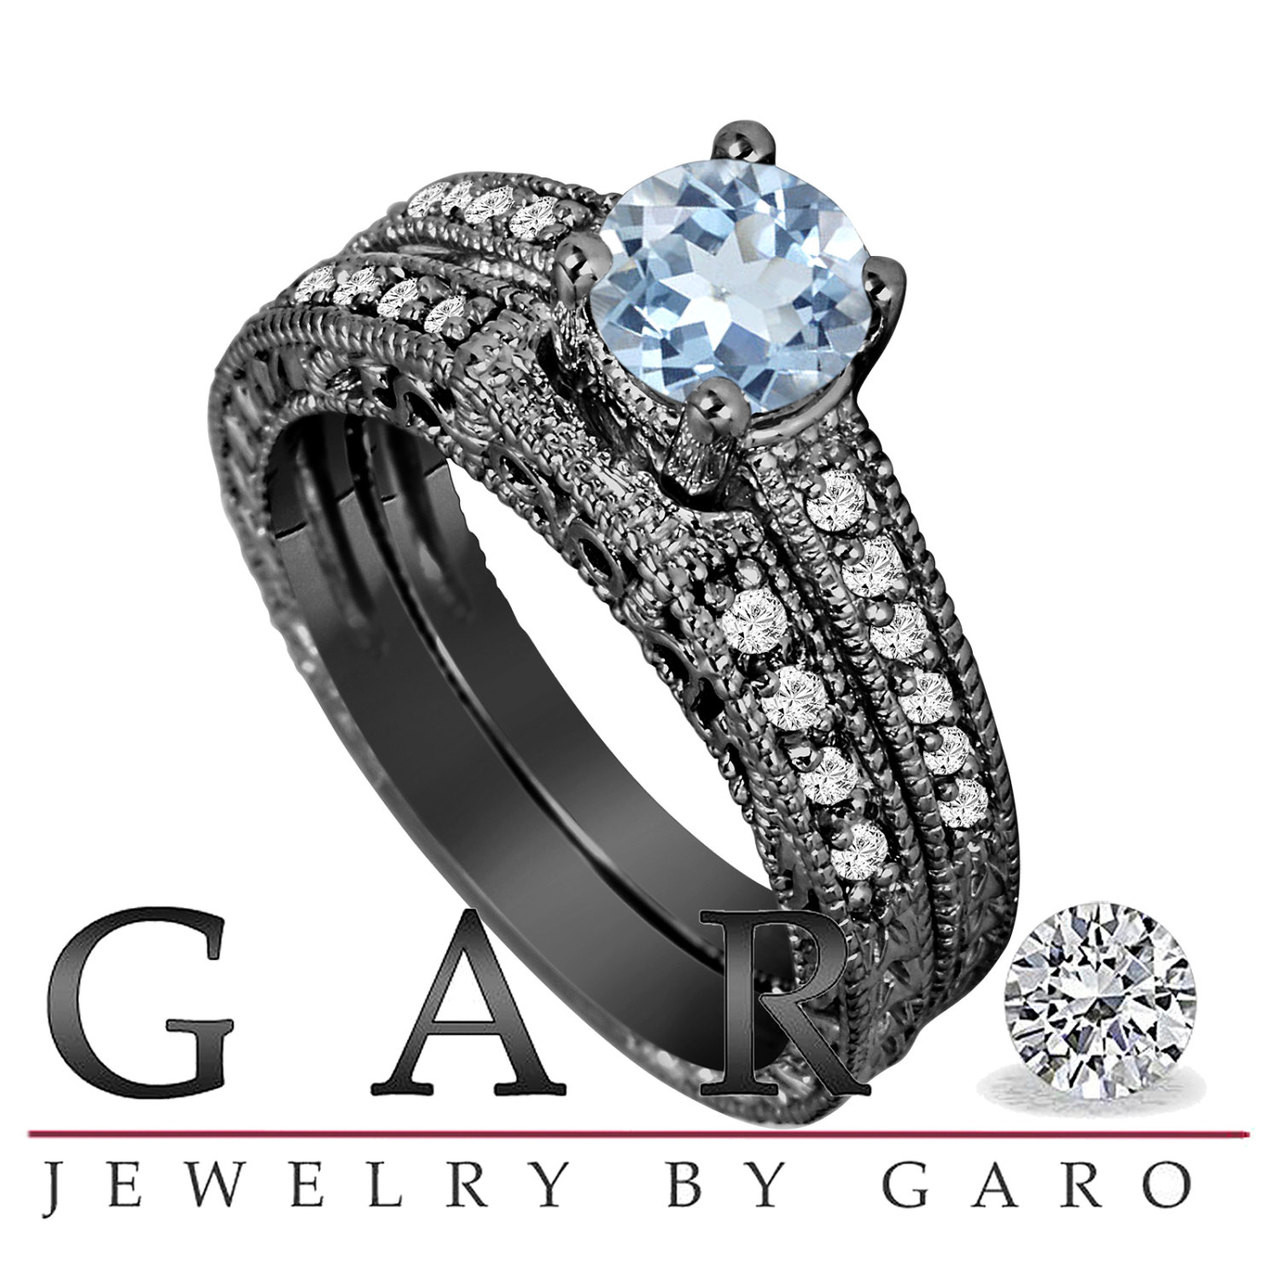 0cd737830 ... Engagement Ring And Wedding Anniversary Diamond Band Sets Vintage Style  14K Black Gold 1.14 Carat HandMade. Price: $1,600.00. Image 1. Larger /  More ...